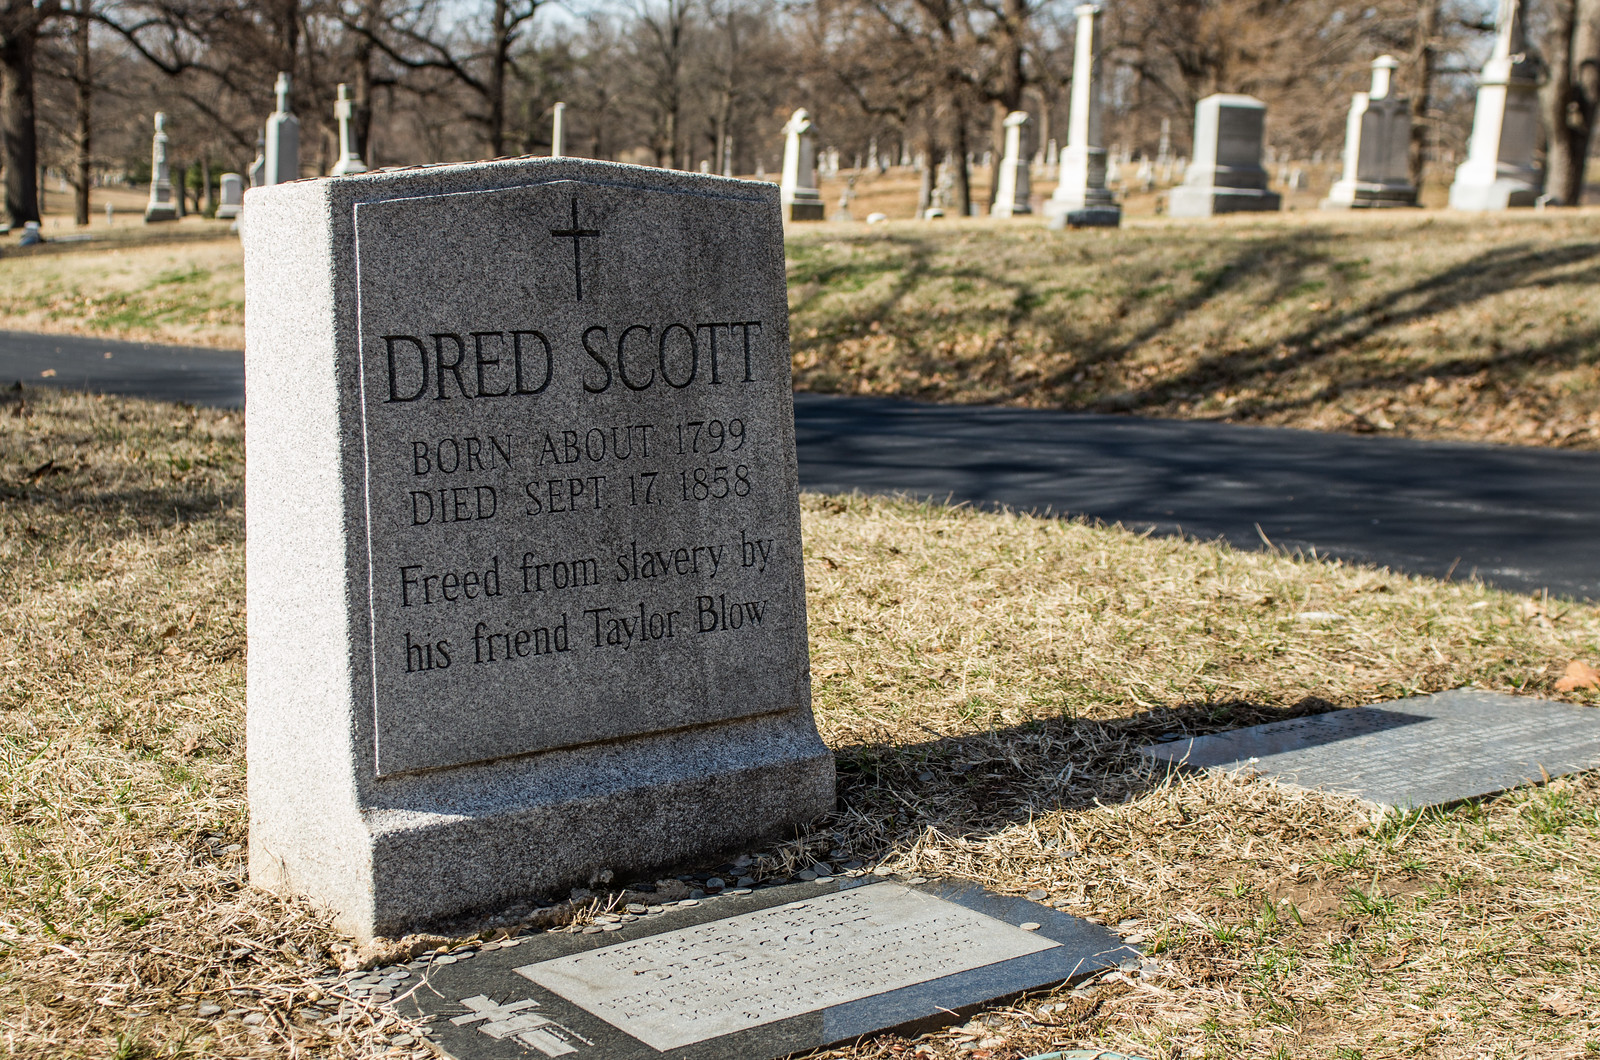 20150315-Bellefontaine Cemetery-PMG_7760-X3.jpg